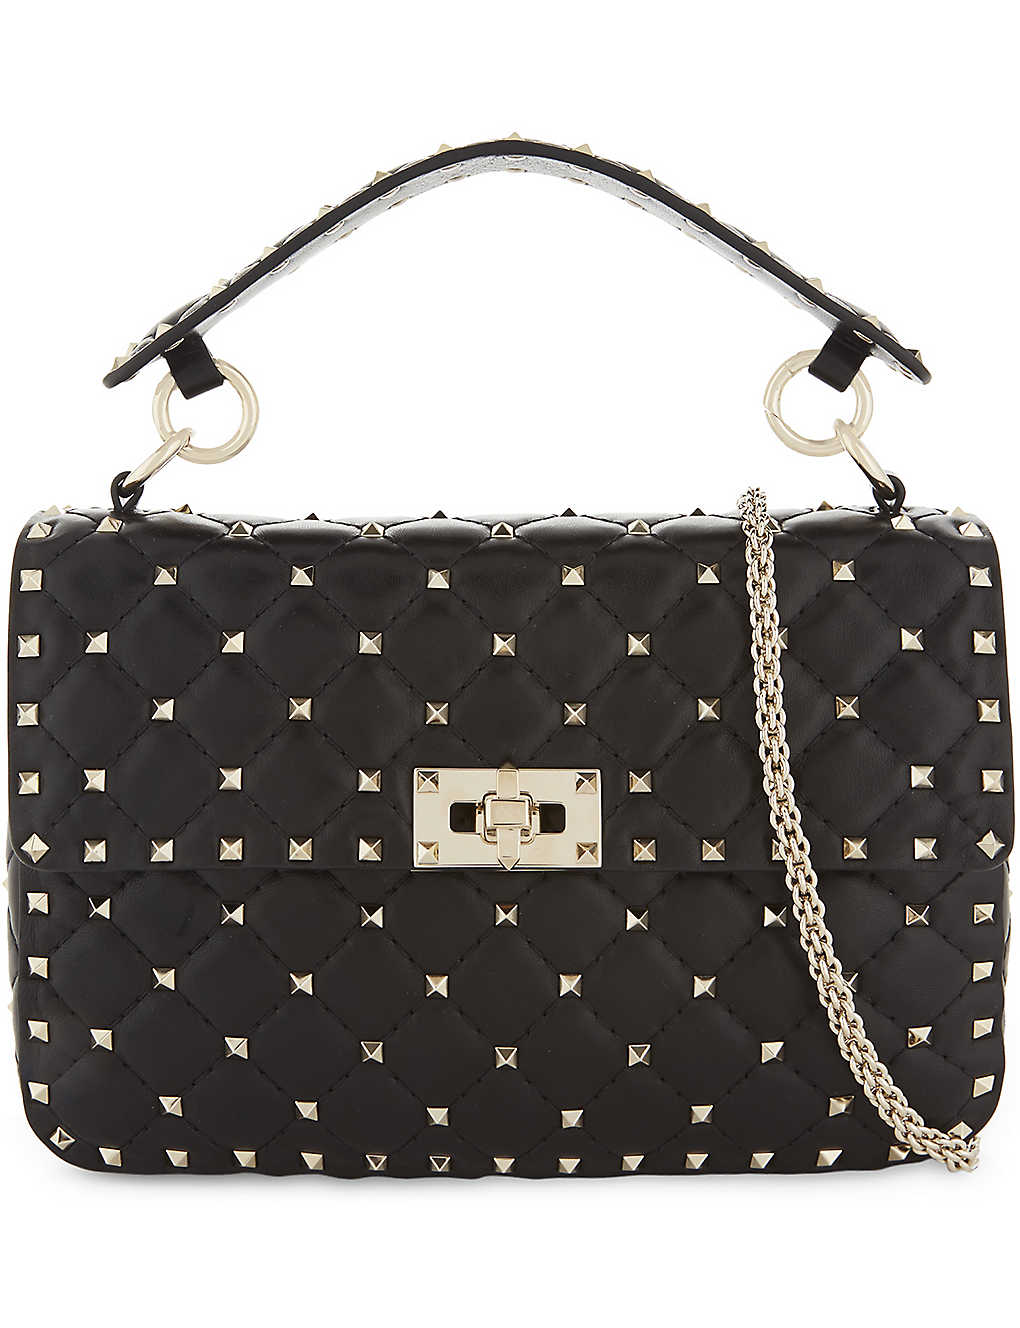 805e723292 VALENTINO - Rockstud medium leather shoulder bag   Selfridges.com